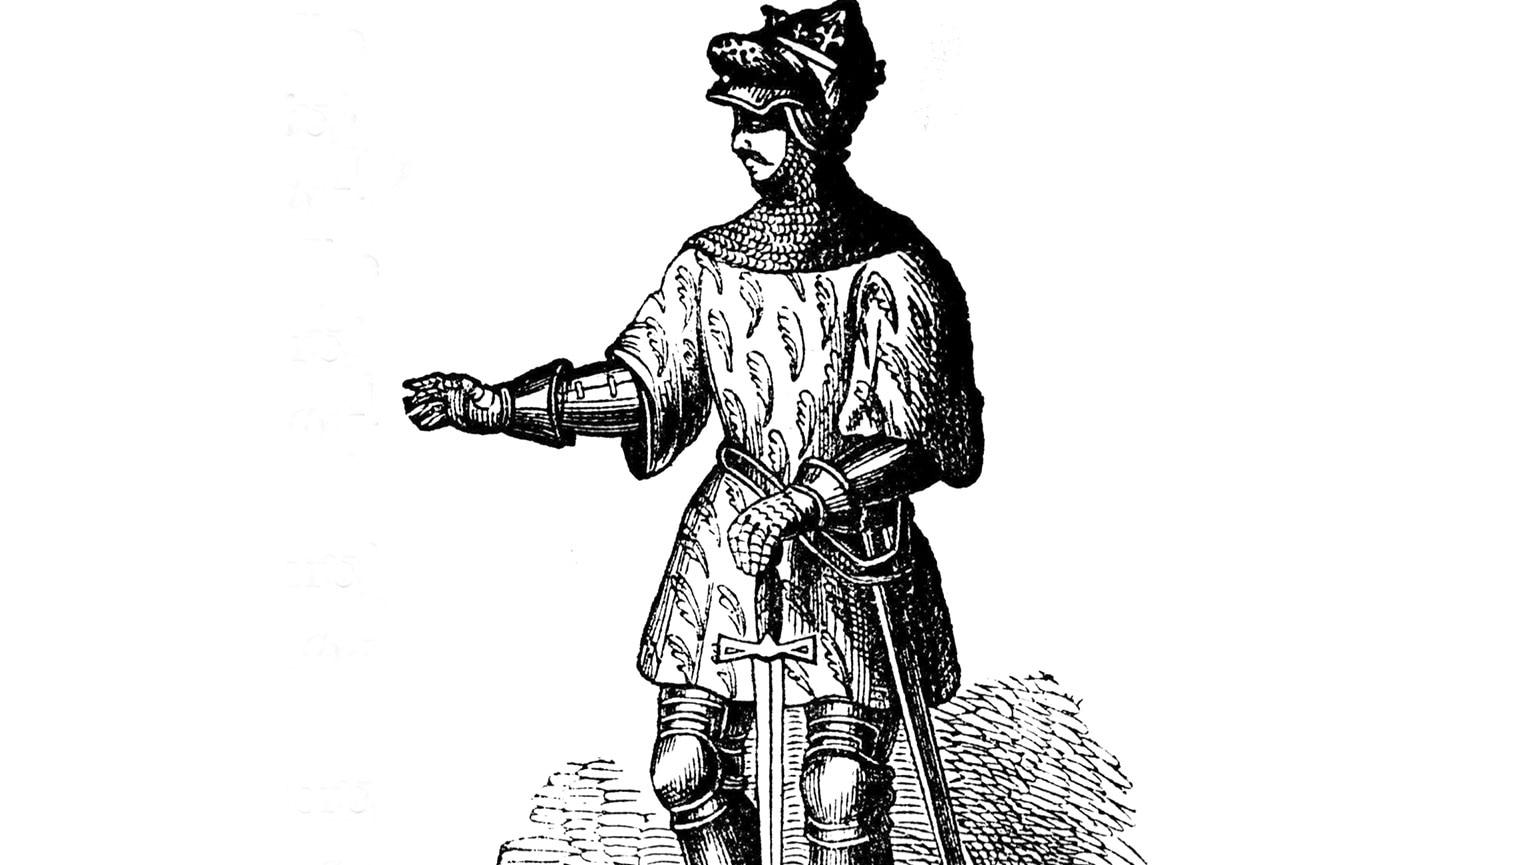 Richard II—The Fall of the King